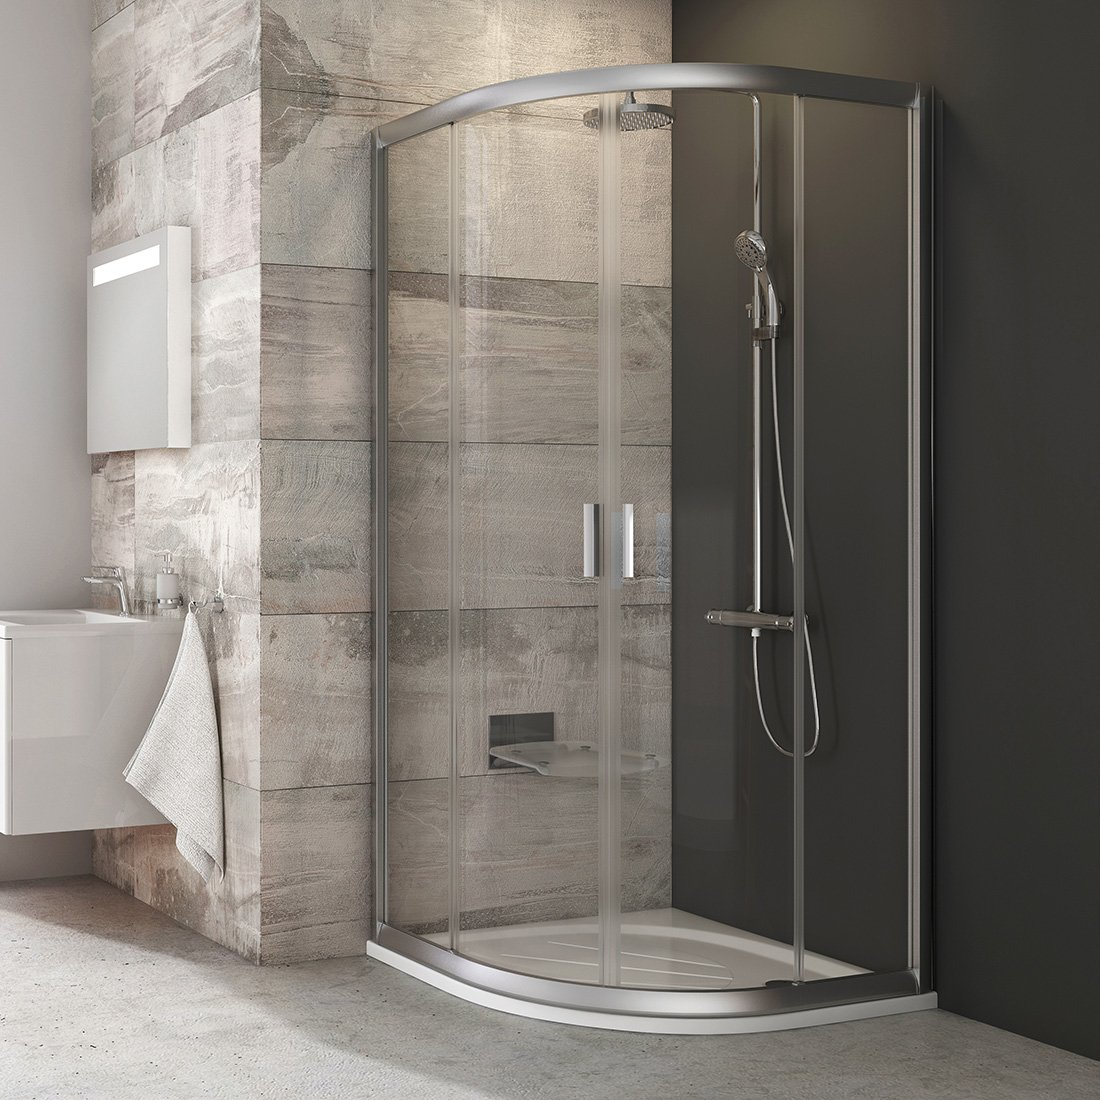 Pusapvalė dušo kabina Ravak Blix, BLCP4-90, satinas+stiklas Transparent